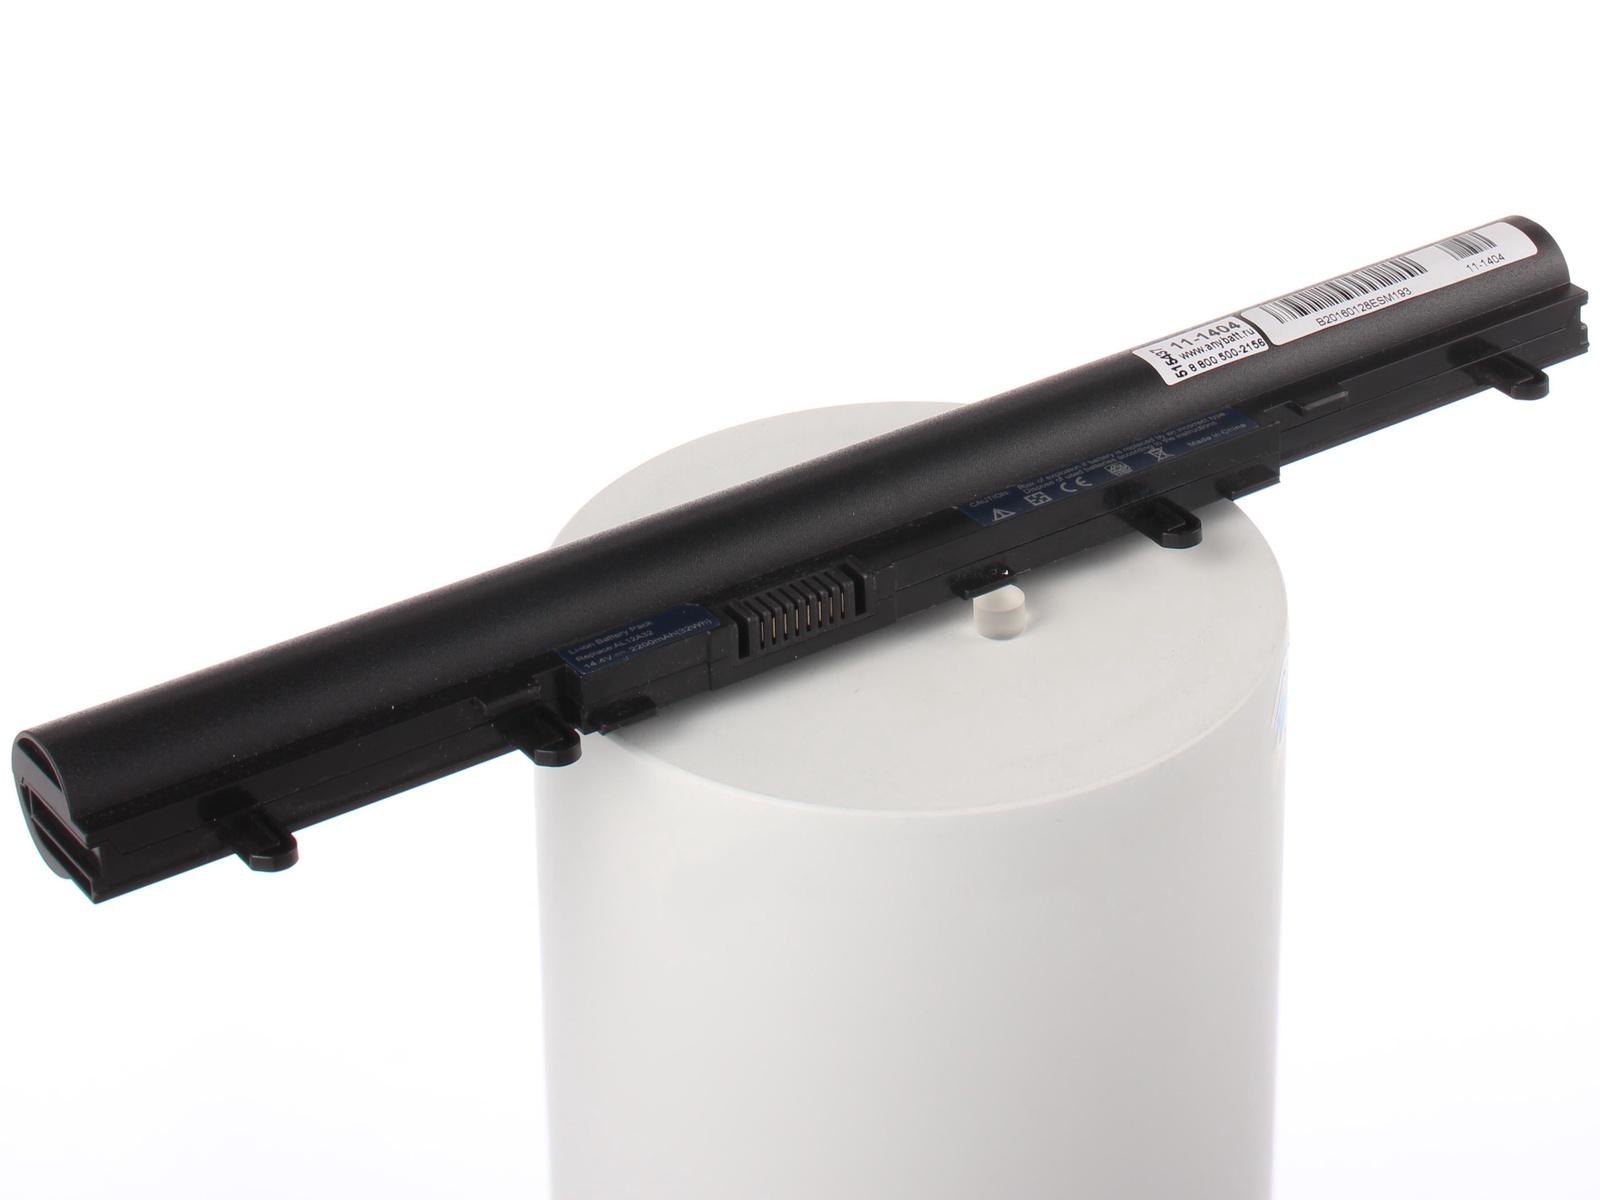 Аккумулятор для ноутбука AnyBatt для Acer Aspire E1-522-65204G1TMnkk, Aspire V5-571G-32364G32Makk, Aspire V5-531G-987B4G50Makk, Aspire V5-471G-53334G50Mabb, Aspire E1-570G-53334G50Mnkk, Aspire E1-570G-33224G50Mnkk аккумулятор для ноутбука anybatt для acer aspire e1 532g 35584g50mnkk aspire e1 570g 33214g32mnkk aspire v5 571pg 73536g75ma aspire e1 470p 6659 aspire e1 522 12504g50mn aspire e1 522 45004g1tmn aspire e1 570g 33214g50mnii